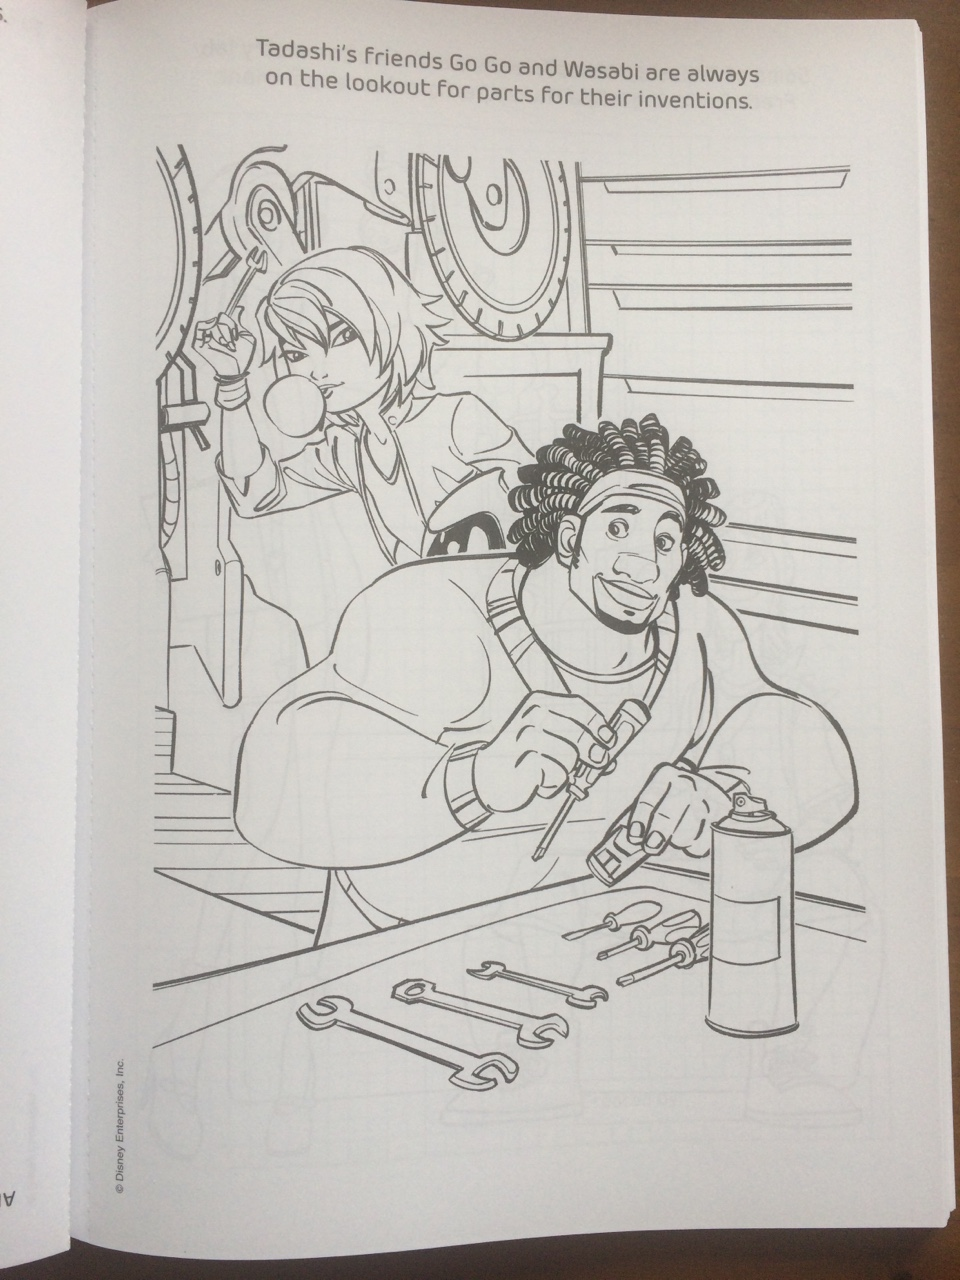 Big Hero 6 Coloring Book Pages - Big Hero 6 Photo ...